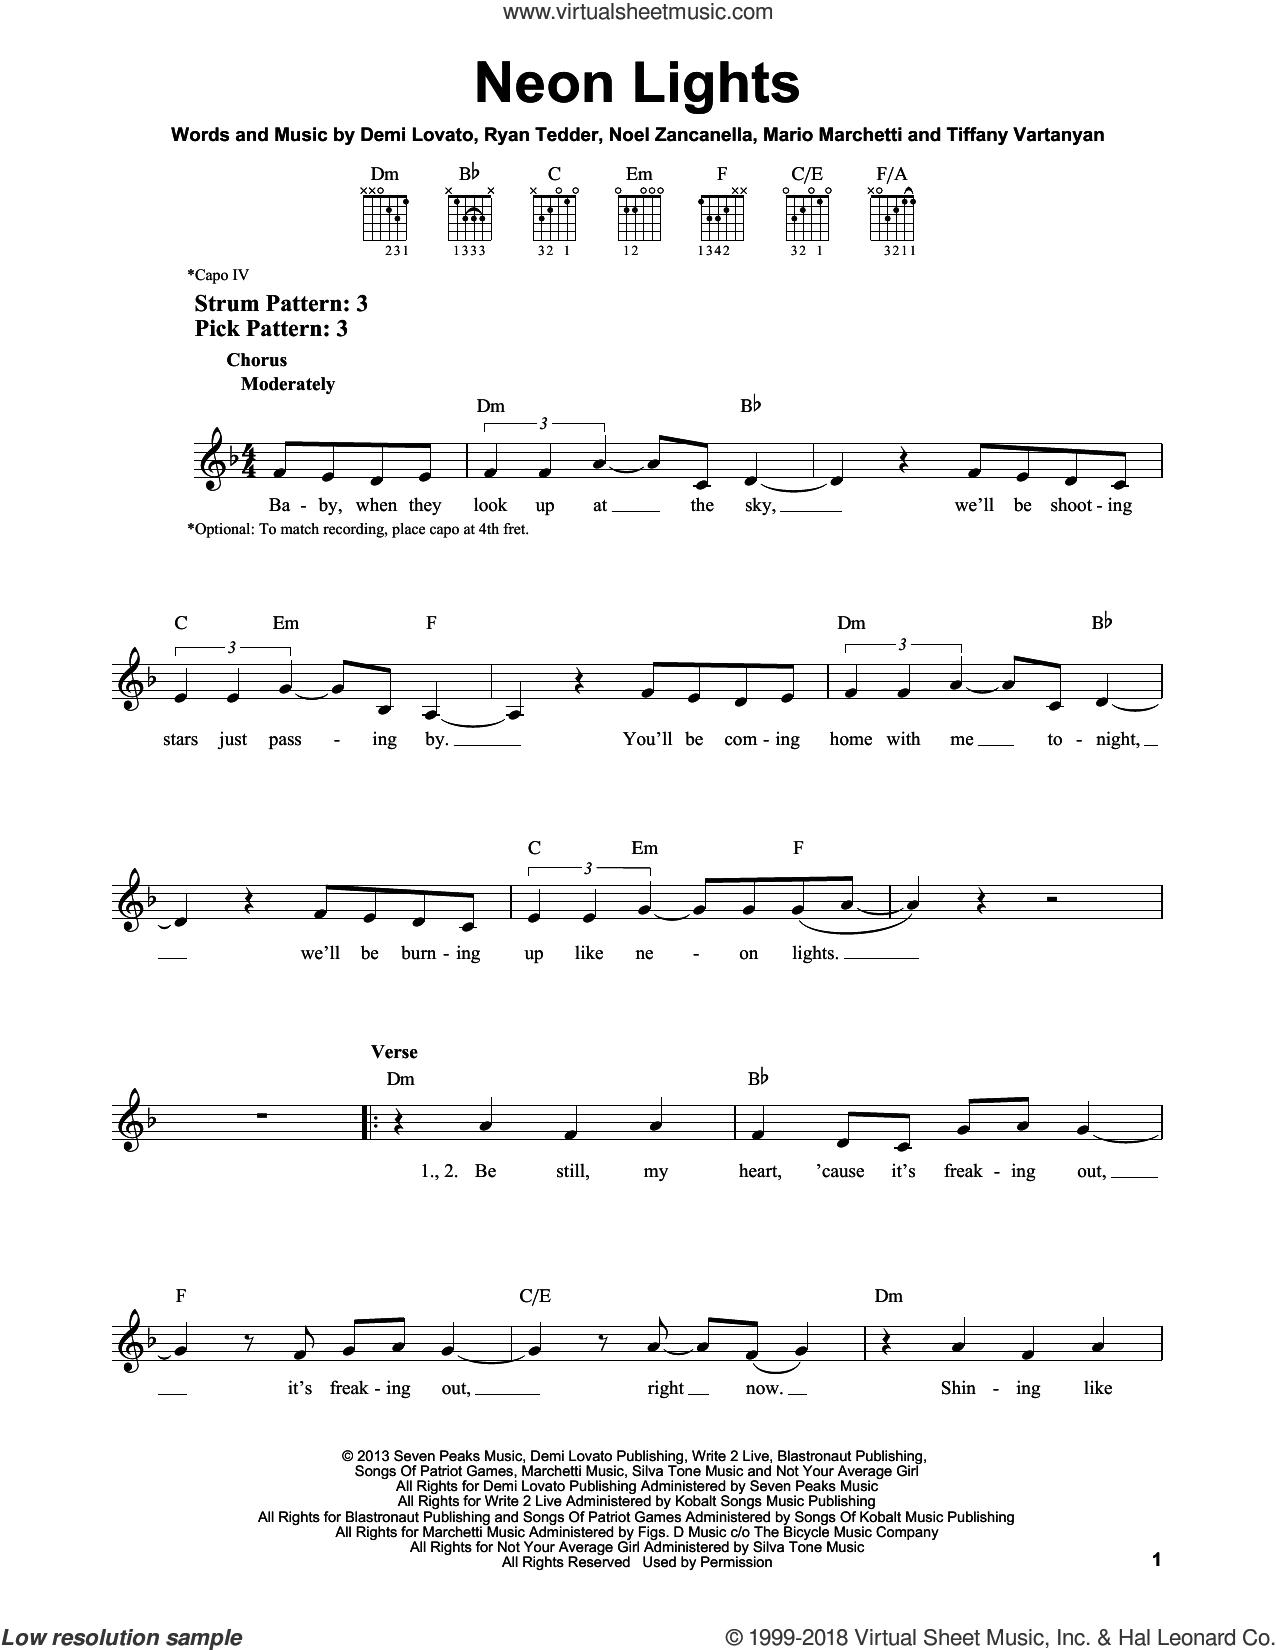 Neon Lights sheet music for guitar solo (chords) by Demi Lovato, Mario Marchetti, Noel Zancanella, Ryan Tedder and Tiffany Vartanyan, easy guitar (chords)